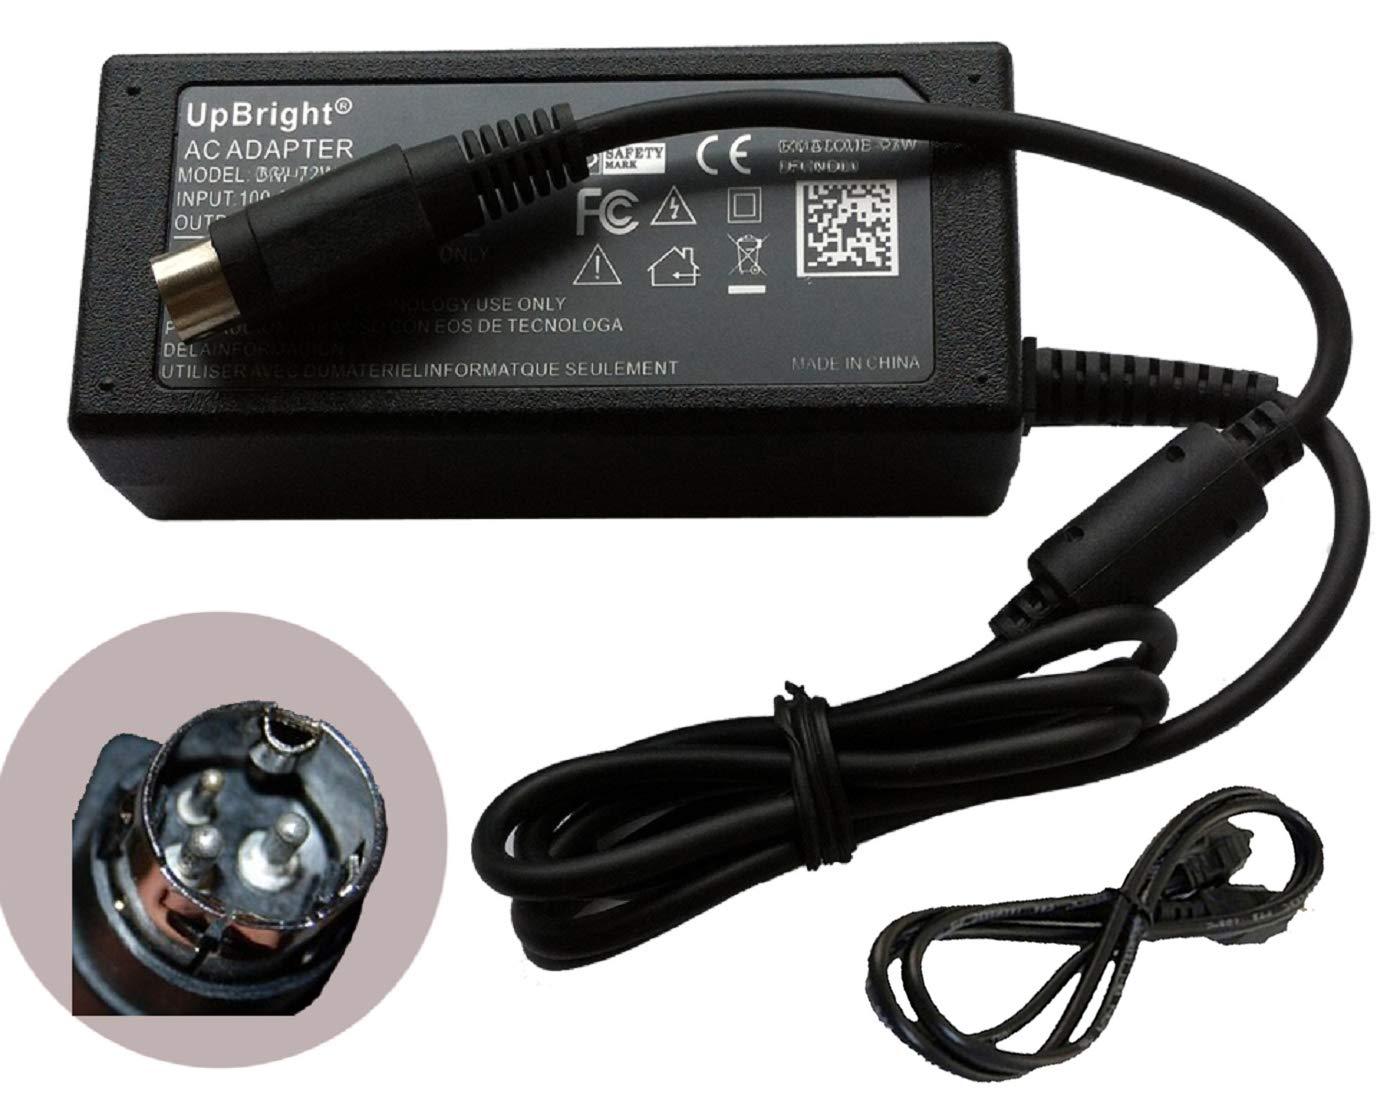 UpBright 3-Pin AC/DC Adapter Replacement For Samsung Bixolon PR10508 SRP-370 SRP-372 Printer SAD06024-UV EPSON ESC POS PRP-085IIIT PRP-250 ECP-500 N&P NRP-2000 NRP-1800 SAM4s ELLIX 35II 45II GIANT-100